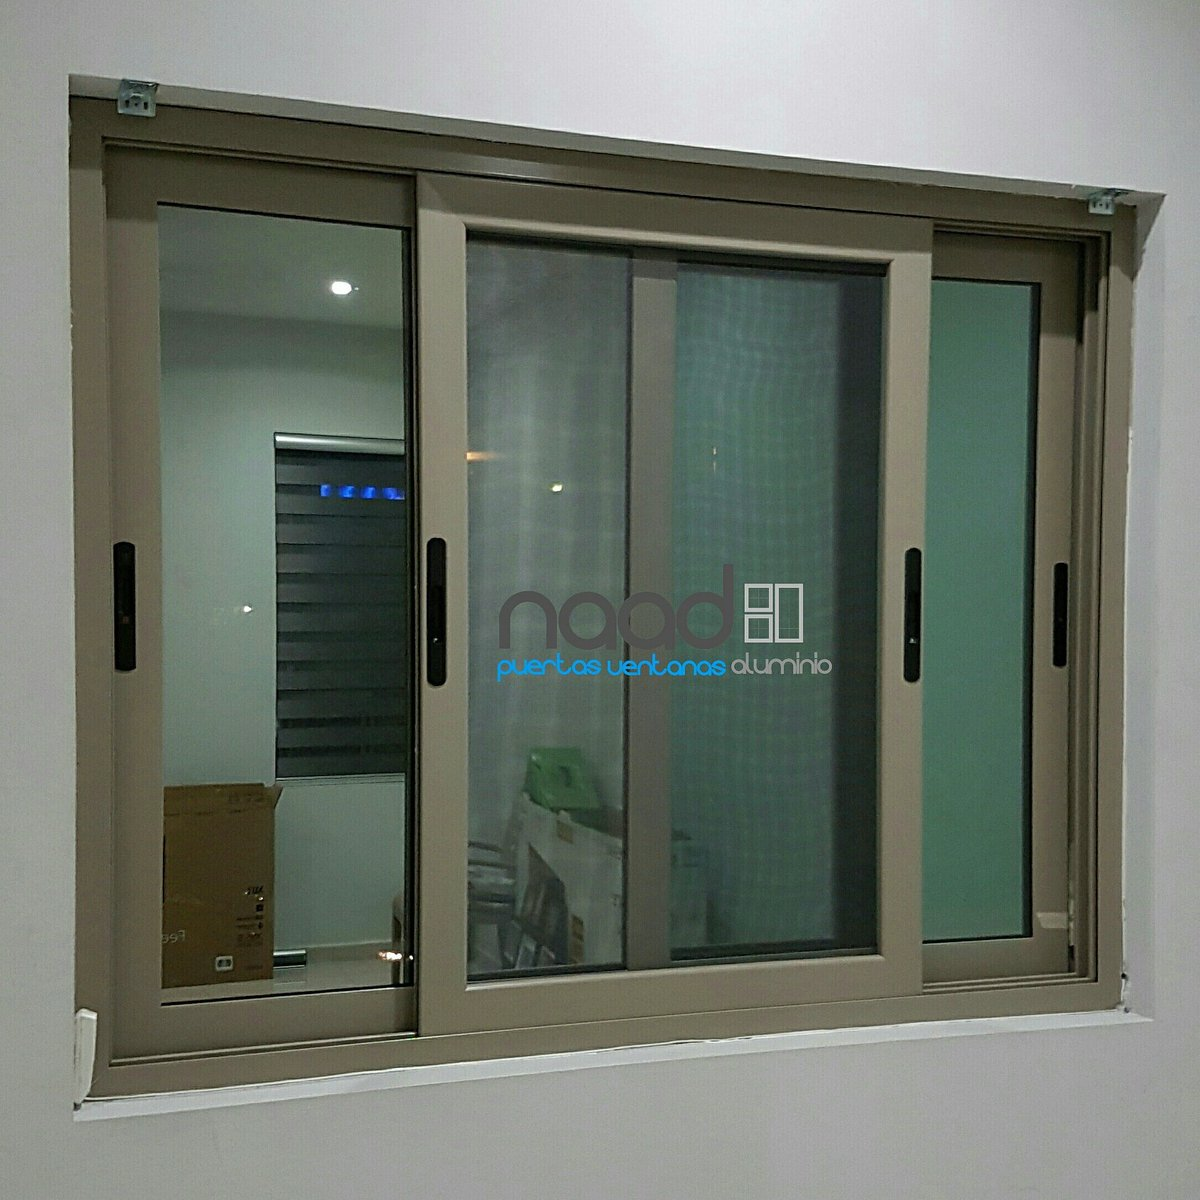 Naad aluminio naad aluminio twitter for Puerta ventana de aluminio corrediza